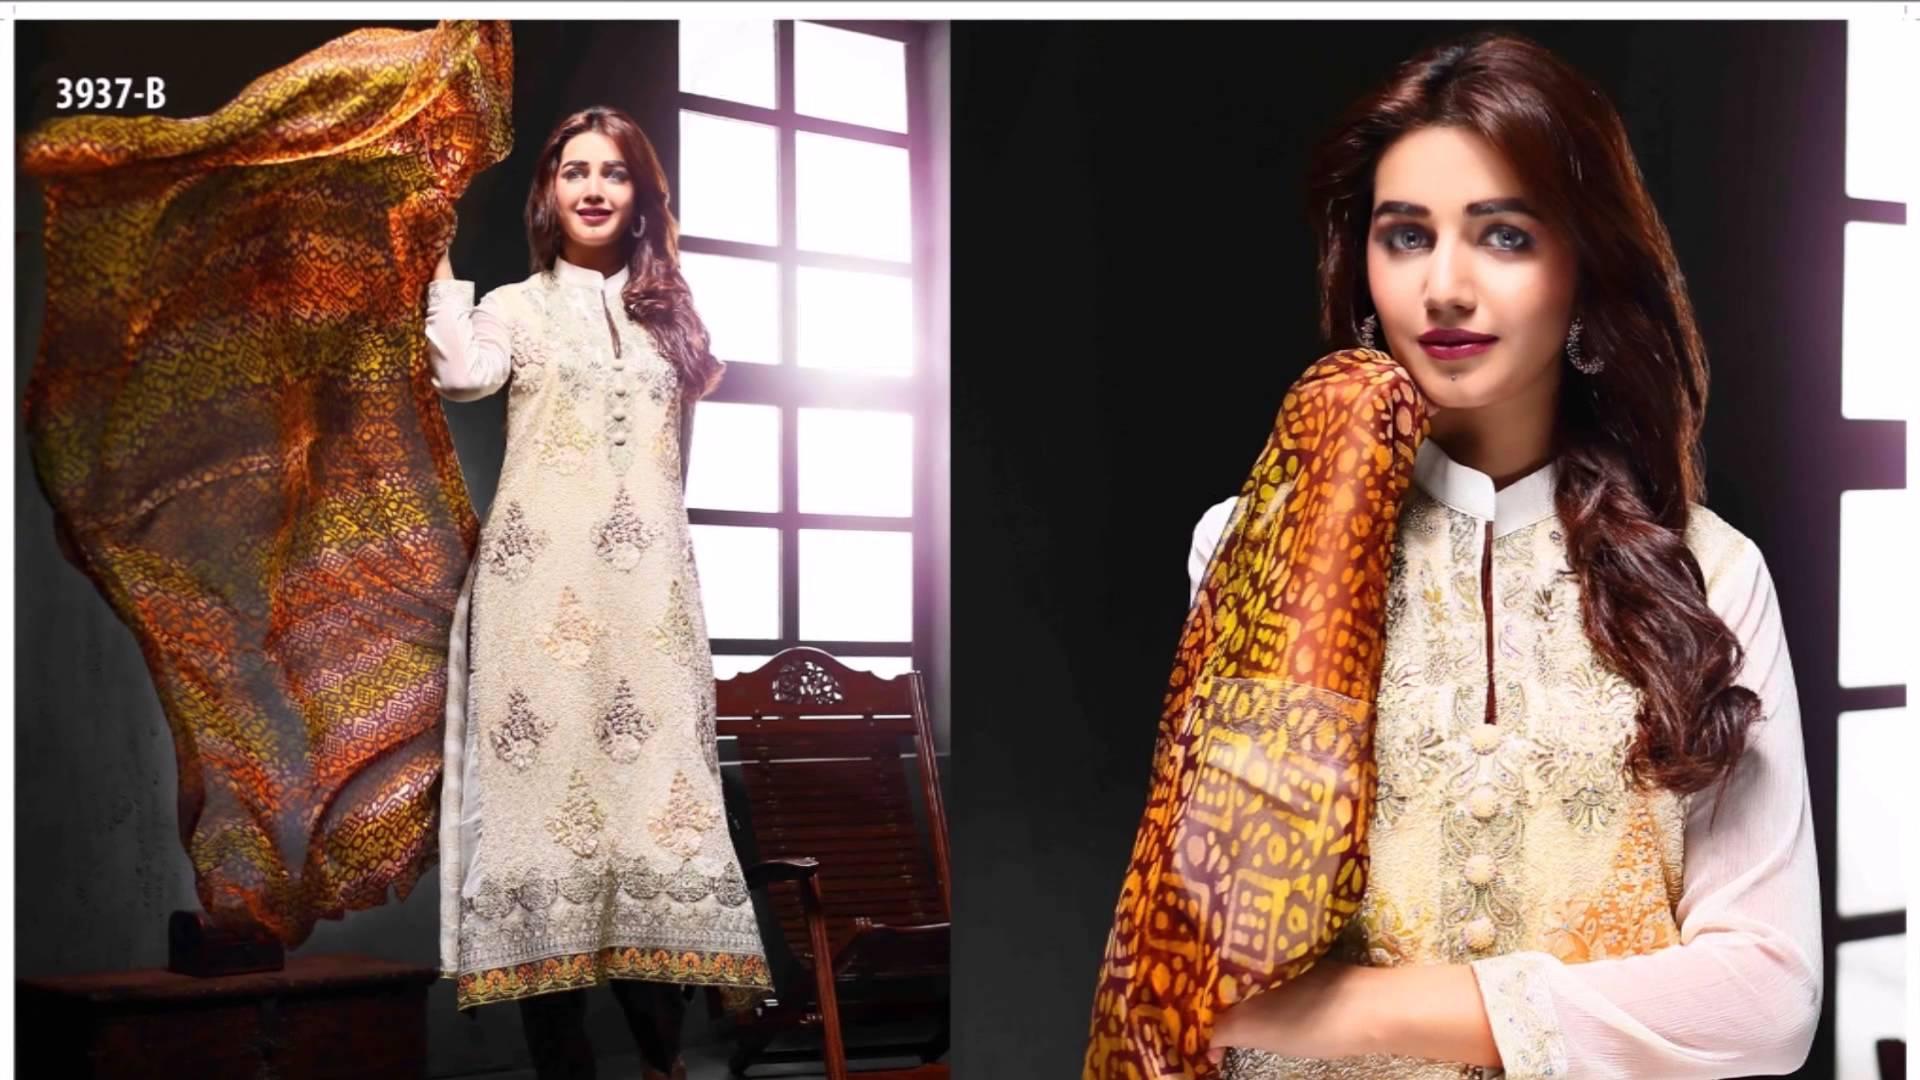 6bb3d52a92 Where to Shop for Exclusive Pakistani Wear in Delhi - DforDelhi